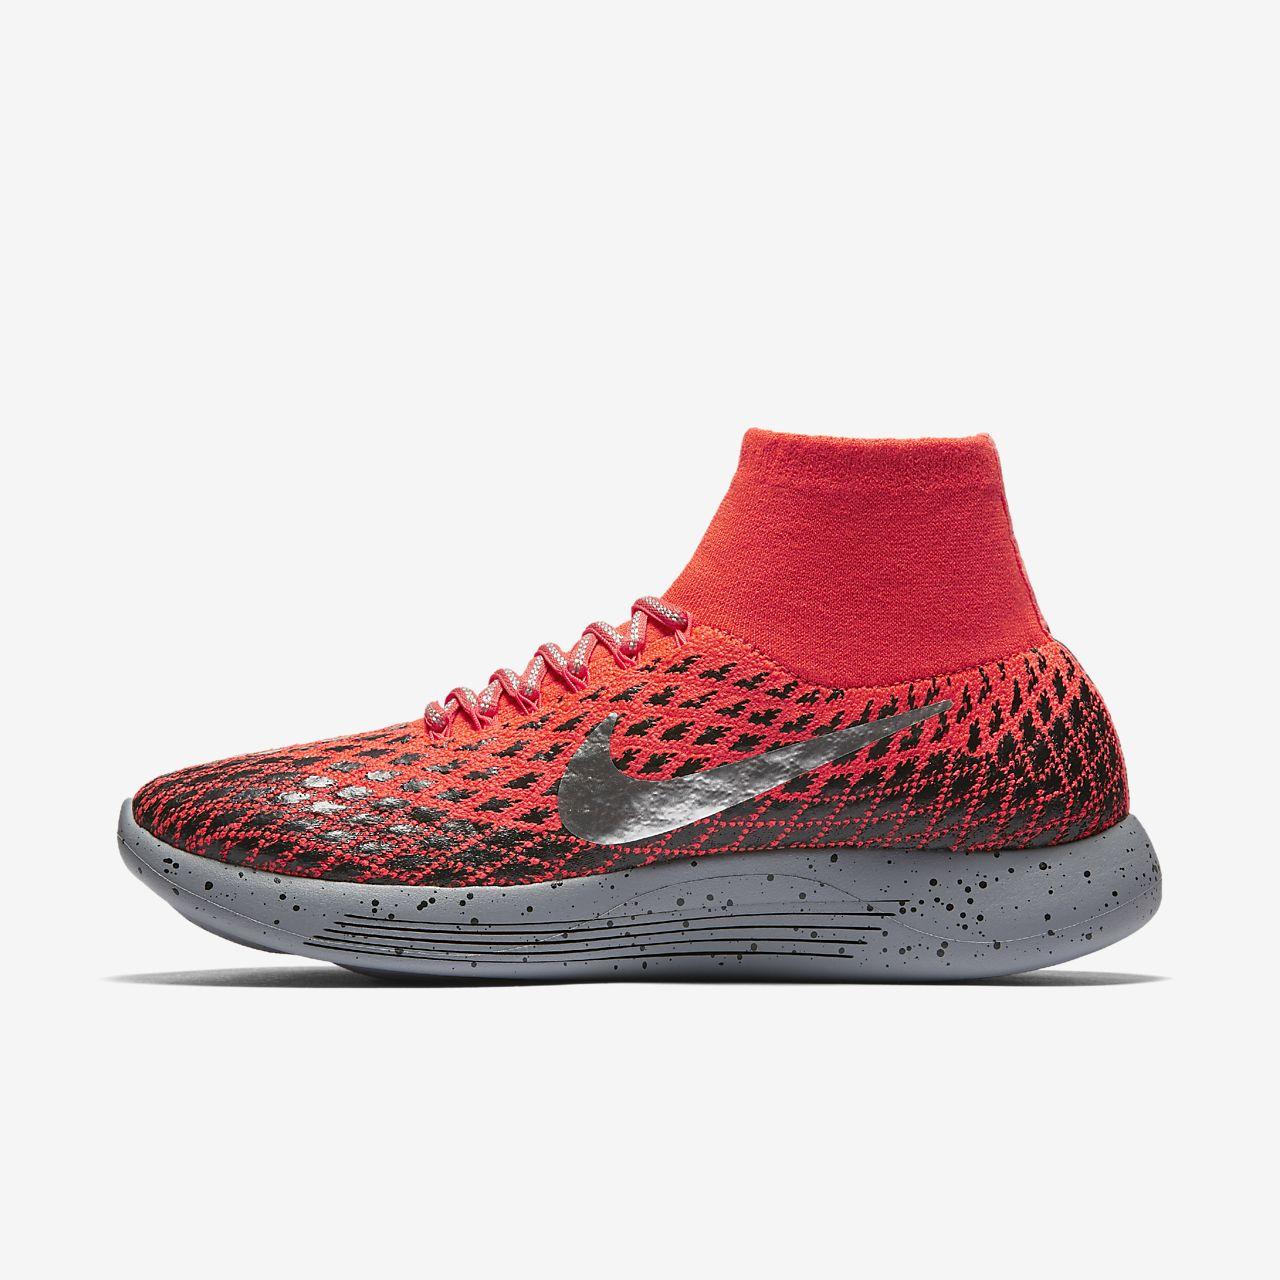 ... Nike LunarEpic Flyknit Shield Men's Running Shoe